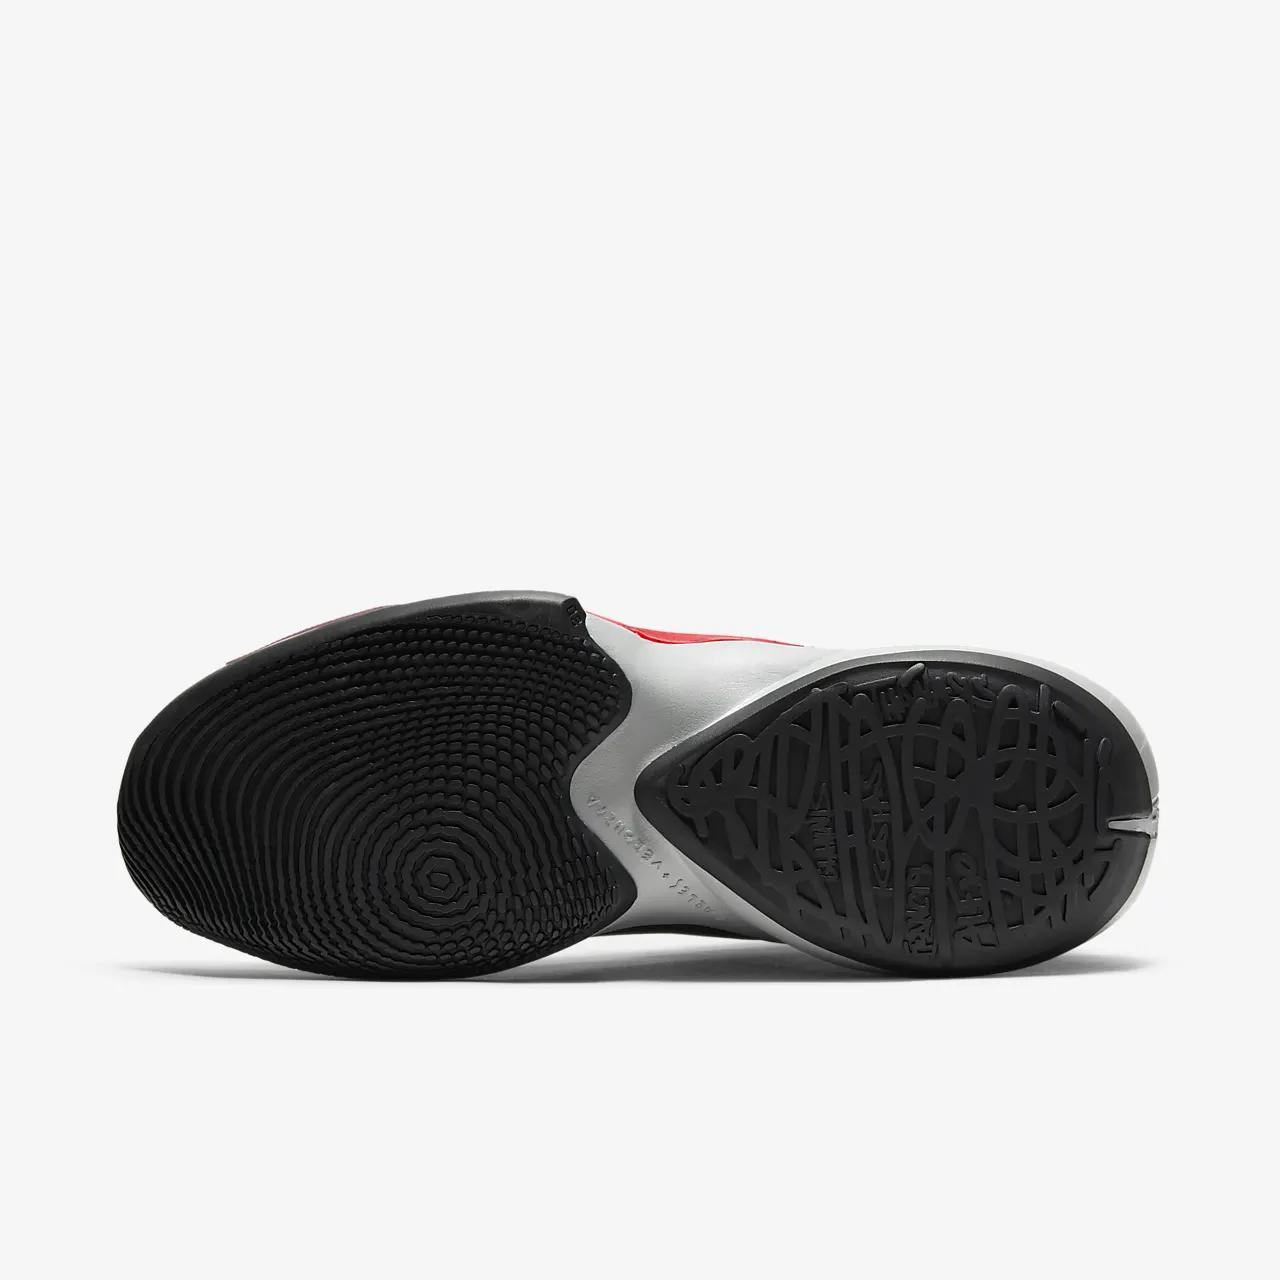 Zoom Freak 2 Basketball Shoe CK5424-003